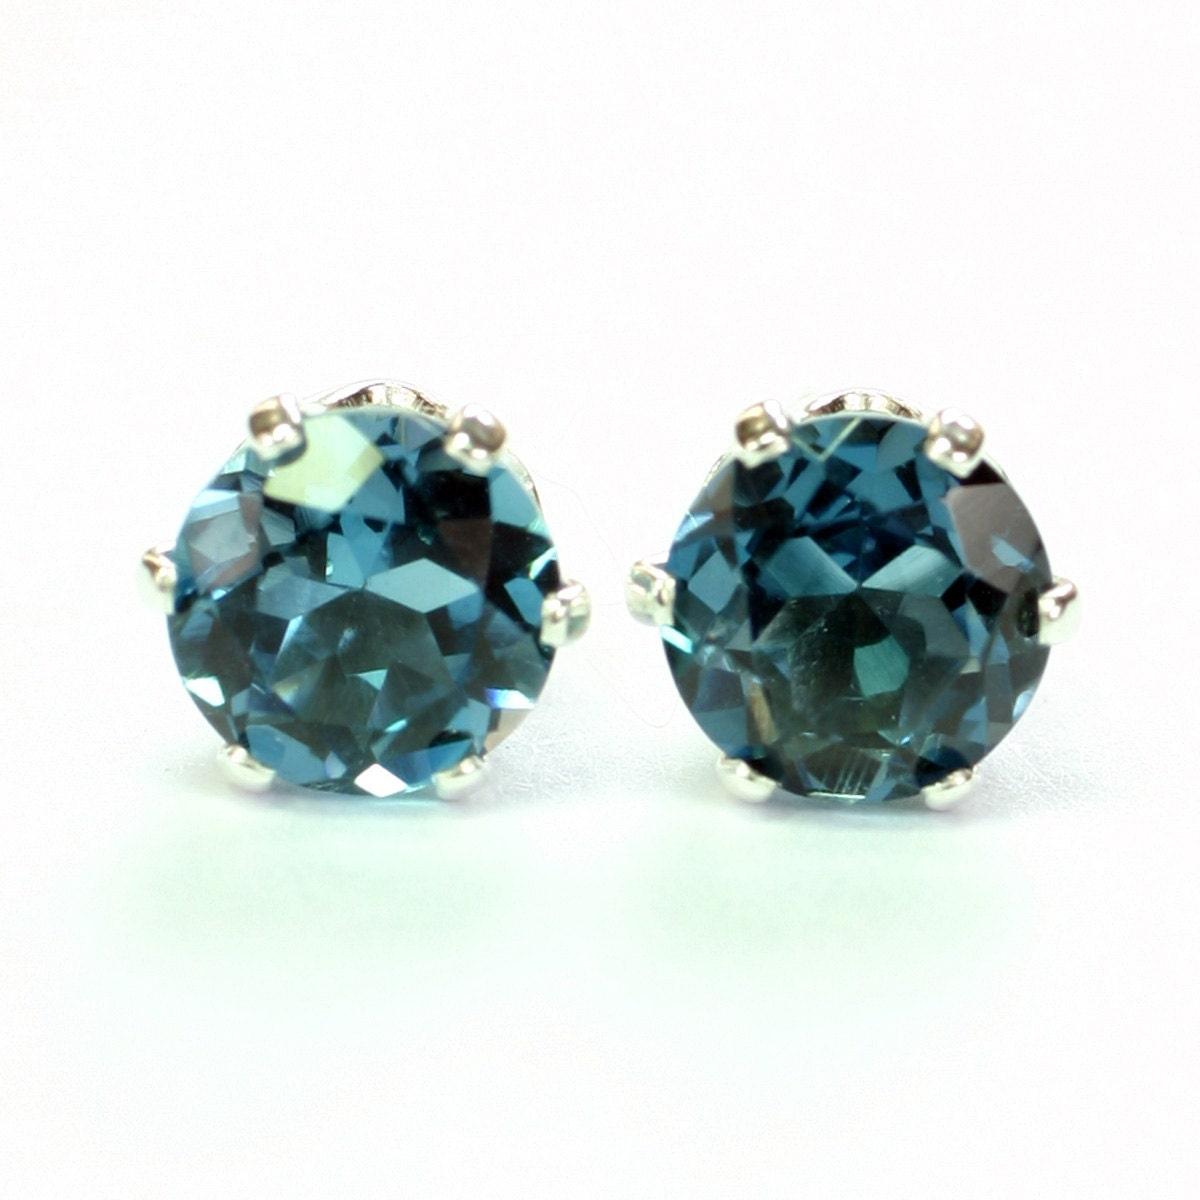 genuine london blue topaz earrings stud earrings sterling. Black Bedroom Furniture Sets. Home Design Ideas